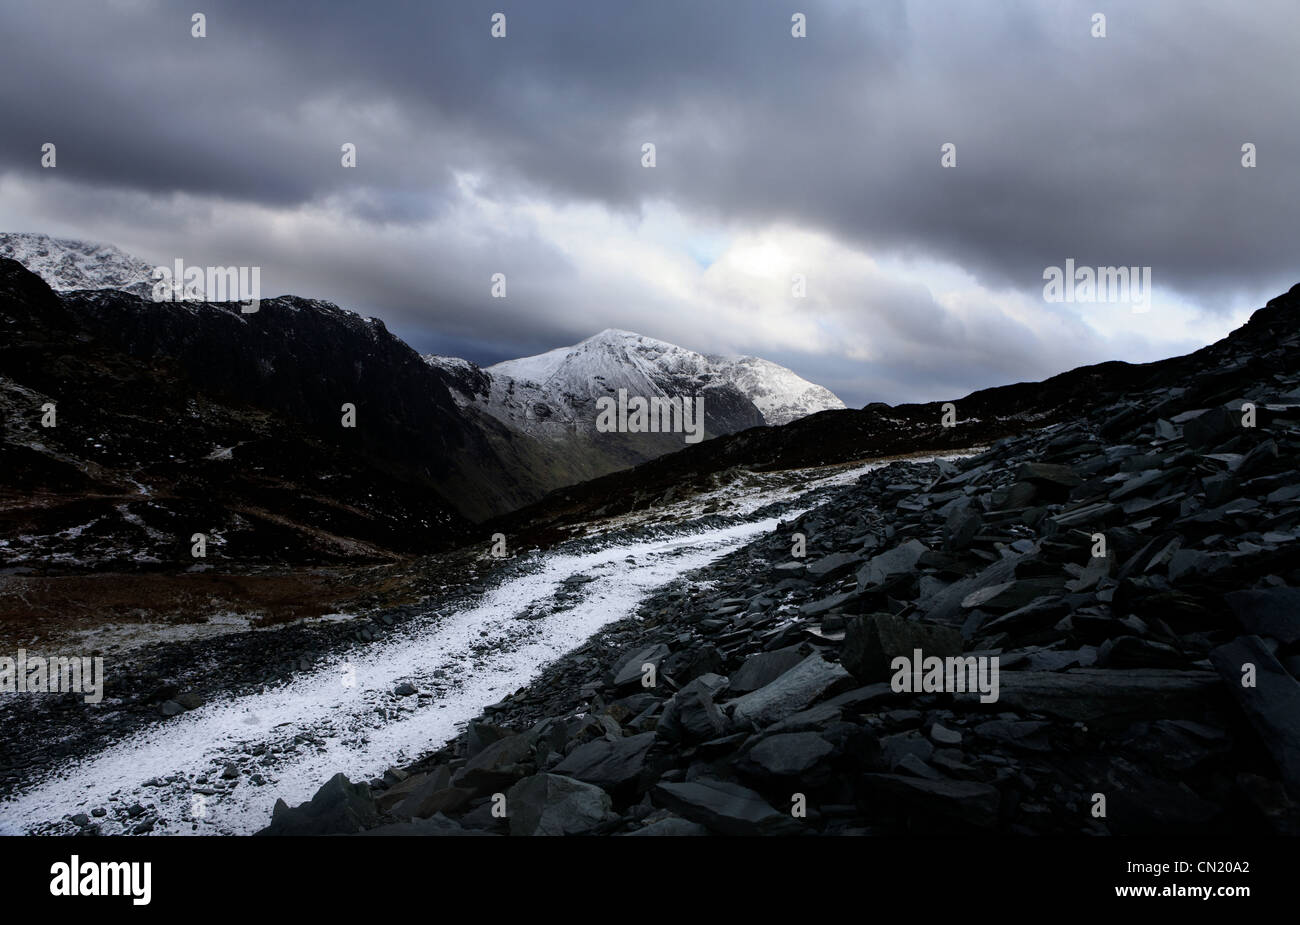 Schnee und Berge Weg, Lake District, Cumbria, England, UK Stockbild